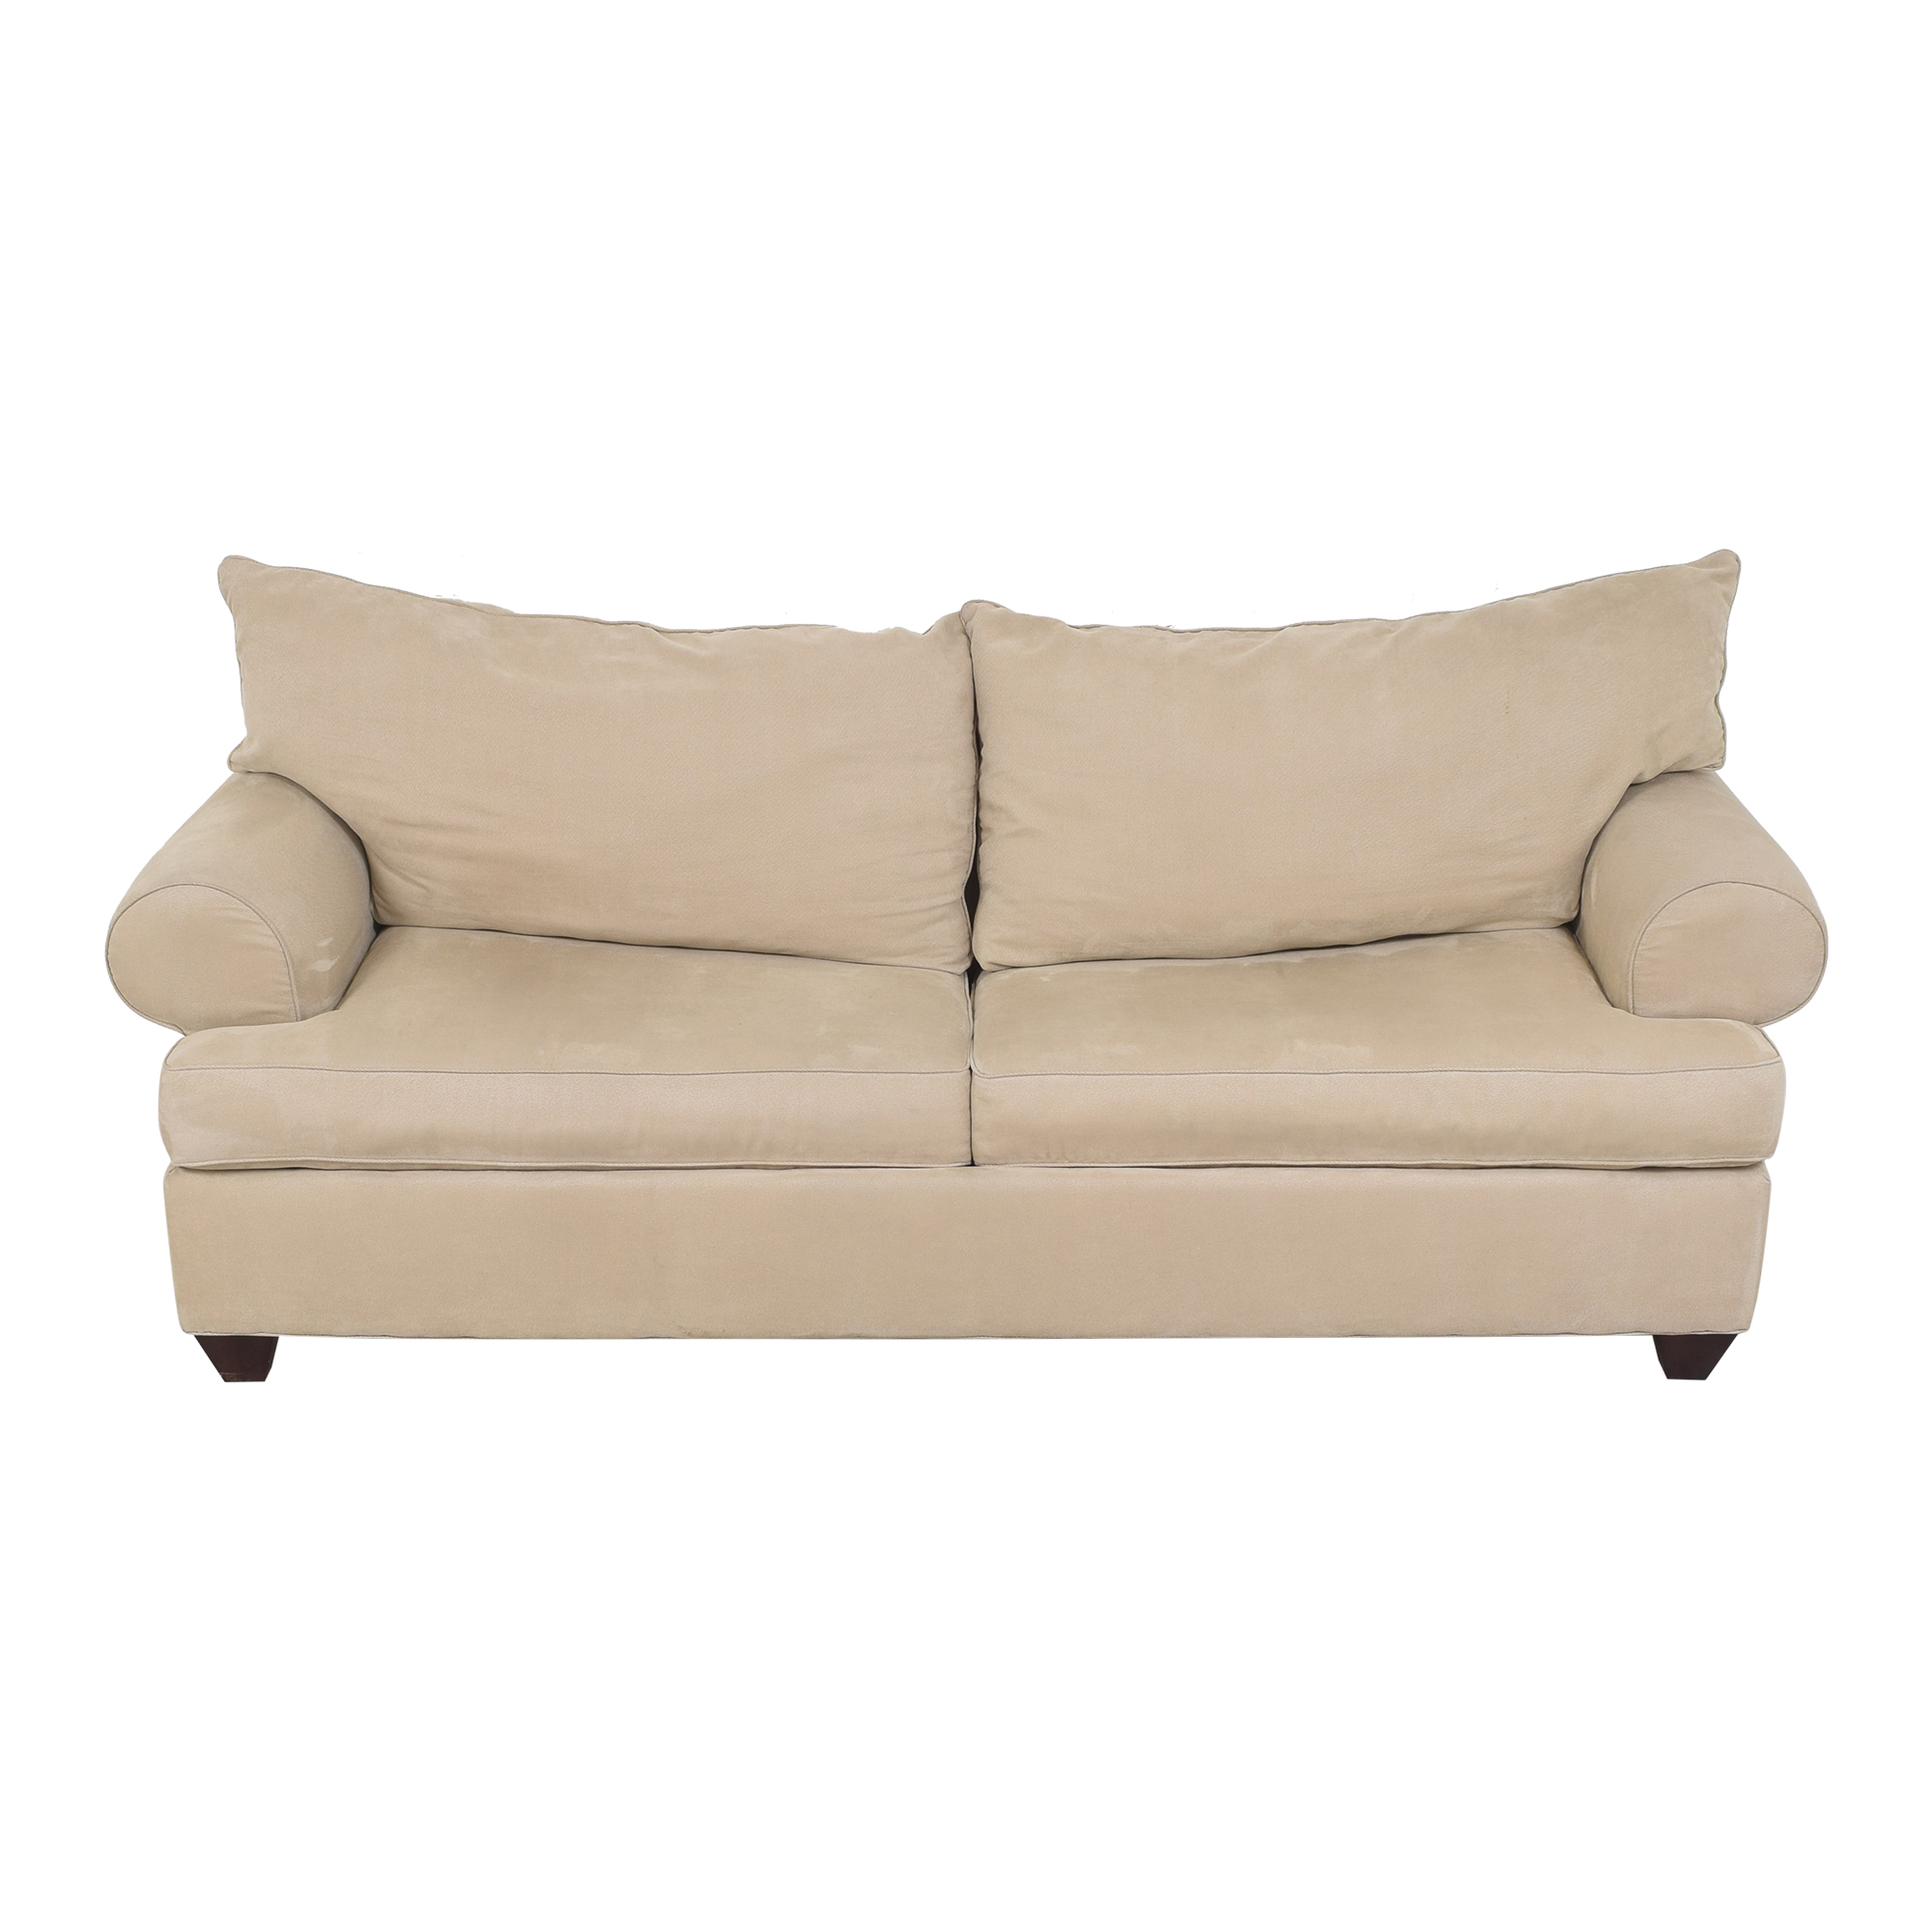 Raymour & Flanigan Raymour & Flanigan Two Cushion Sleeper Sofa discount